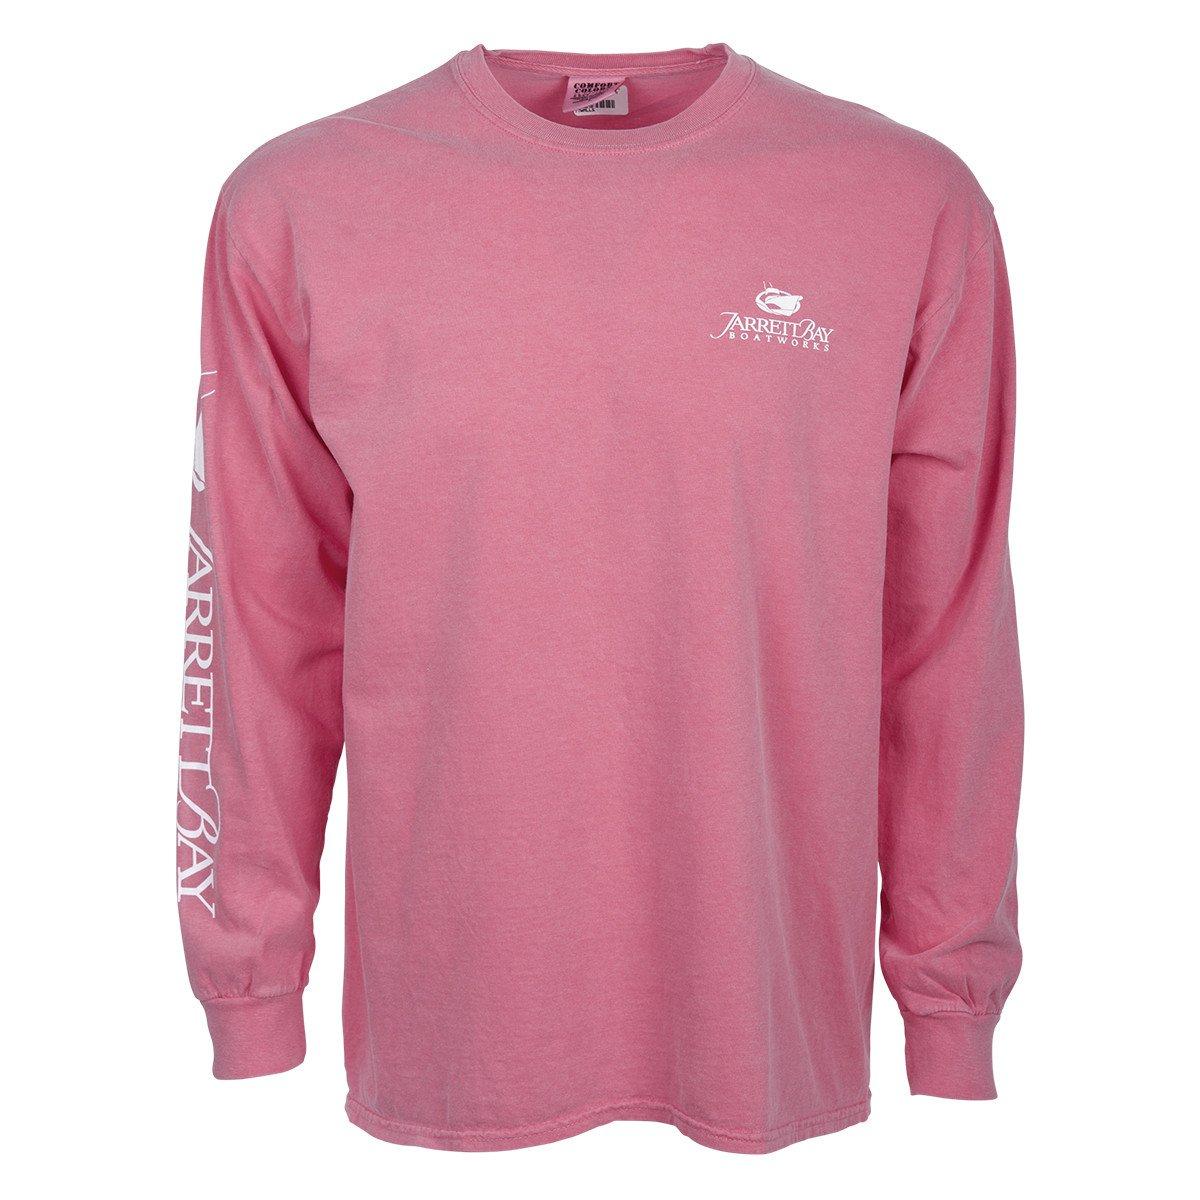 1200x1200 77 Line Drawing Long Sleeve T Shirt